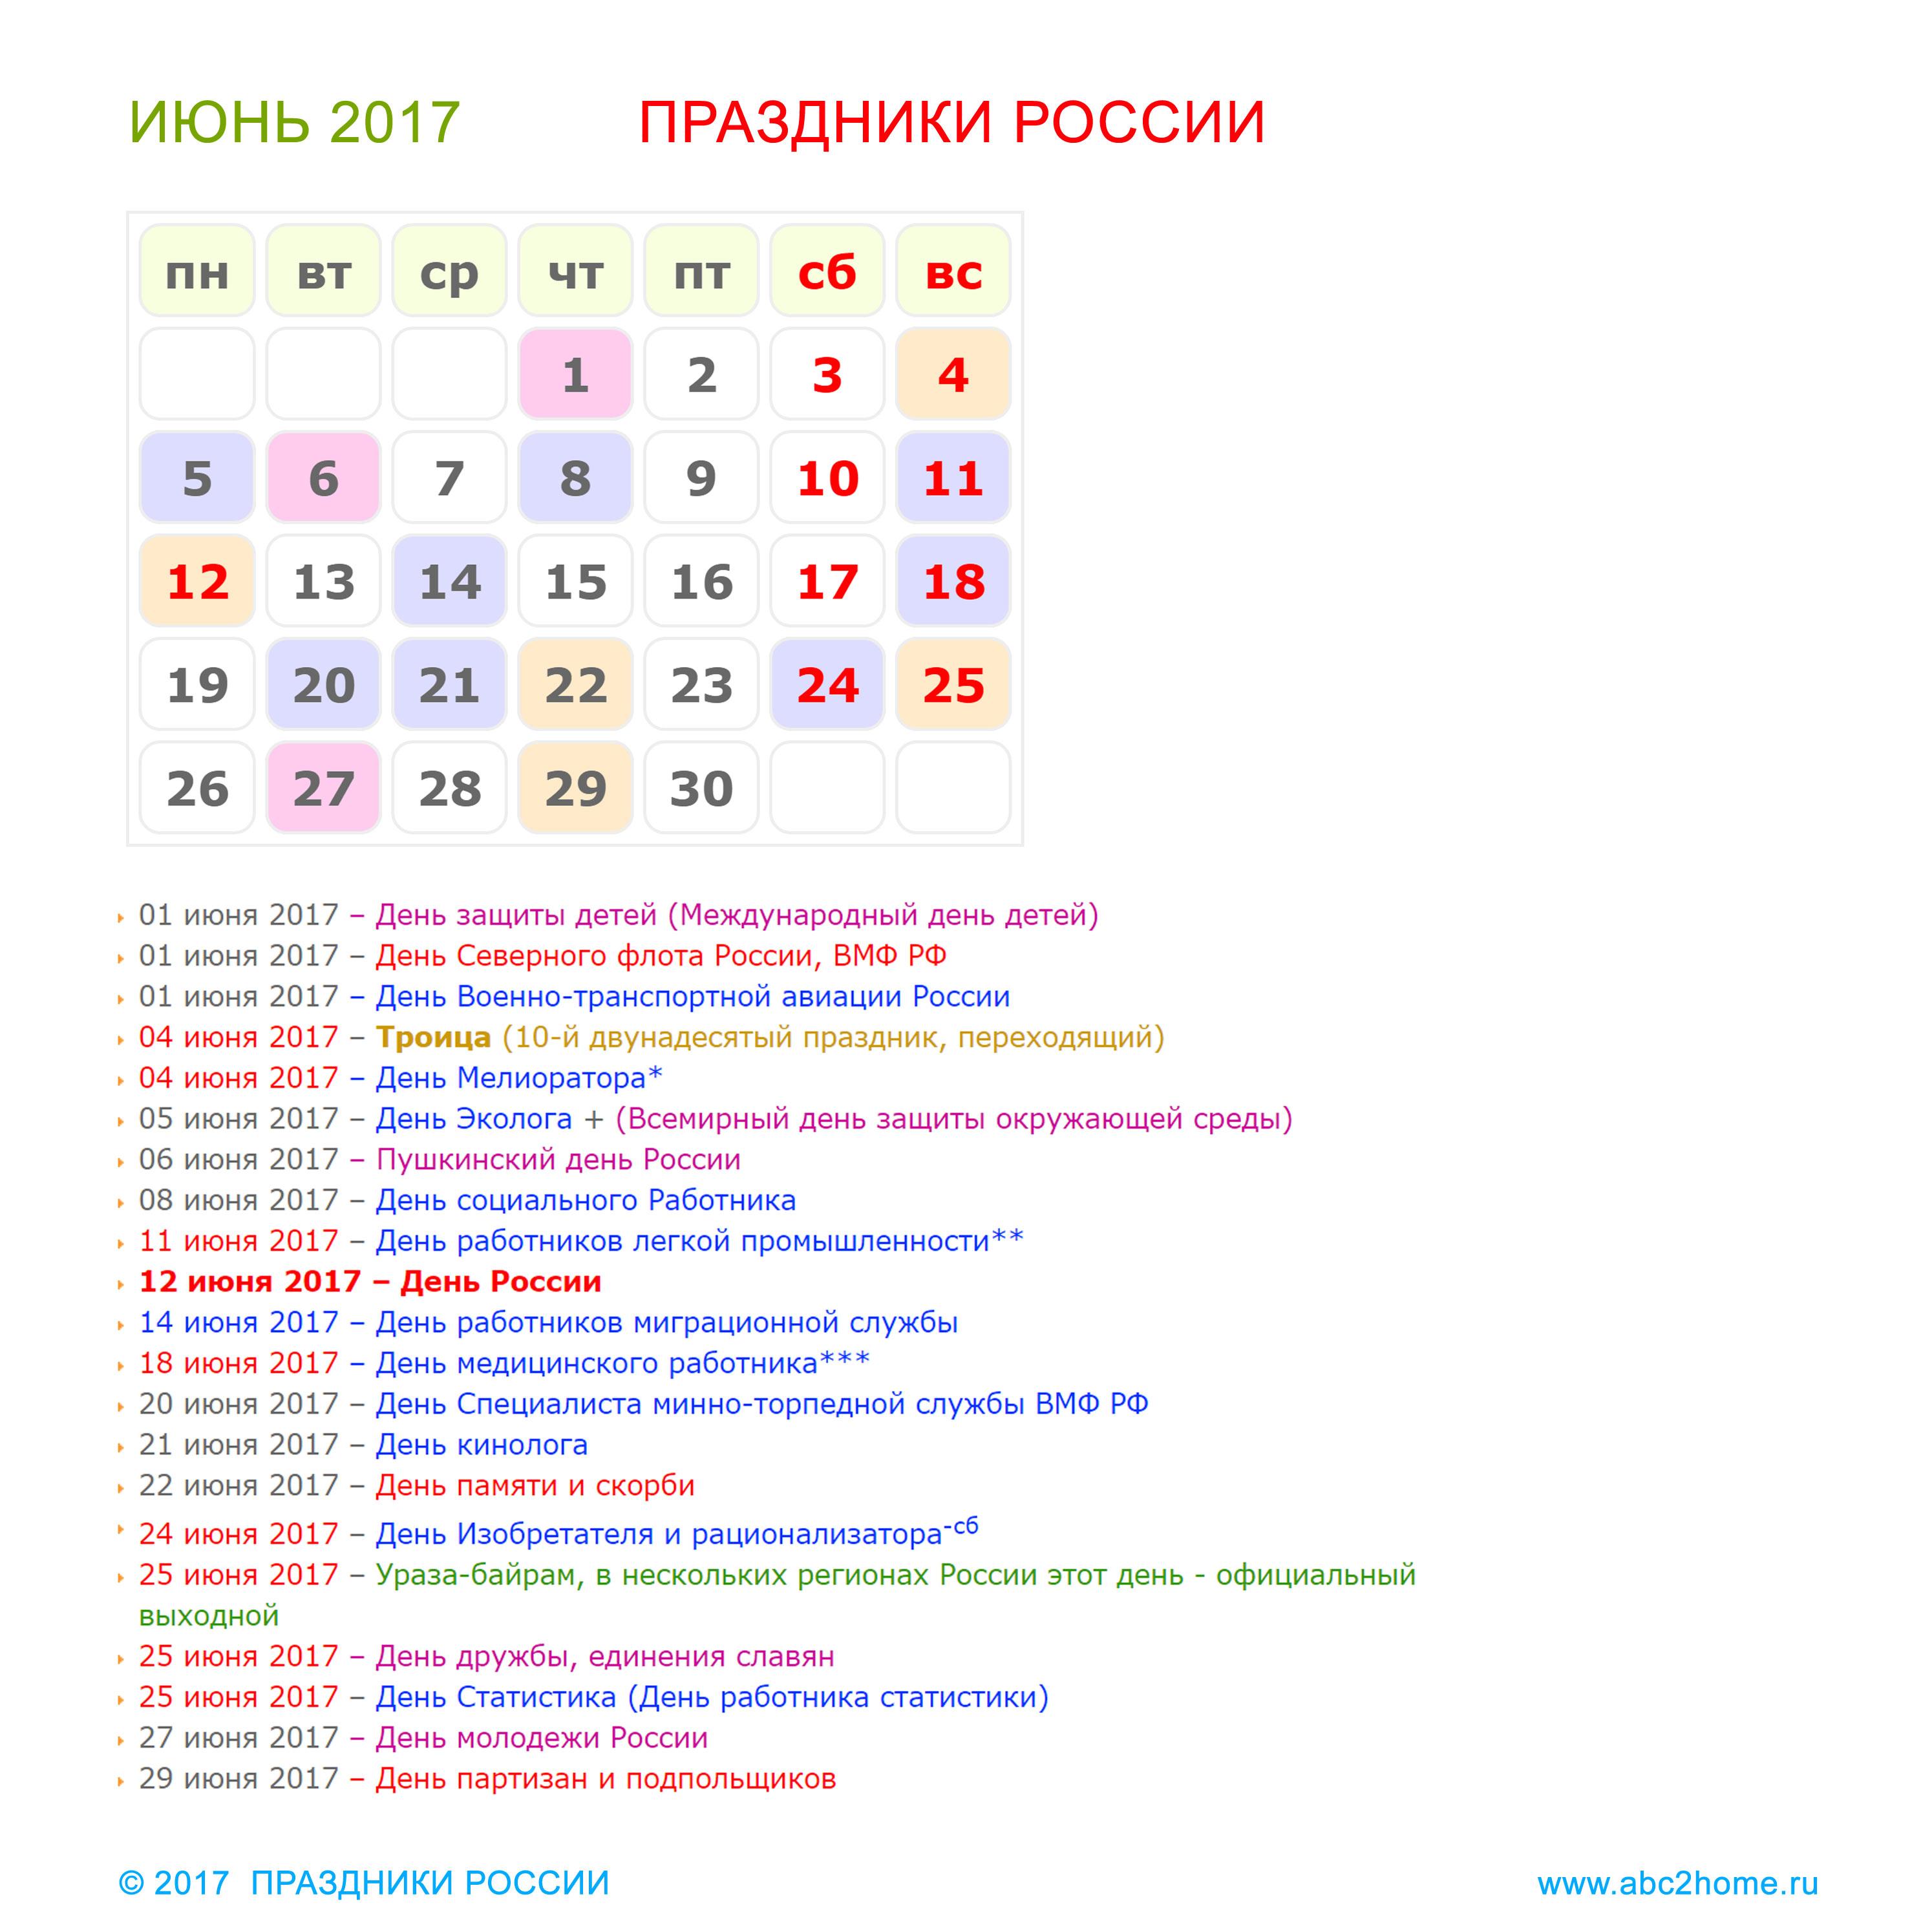 prazdniki_rossii_iyun_2017.jpg